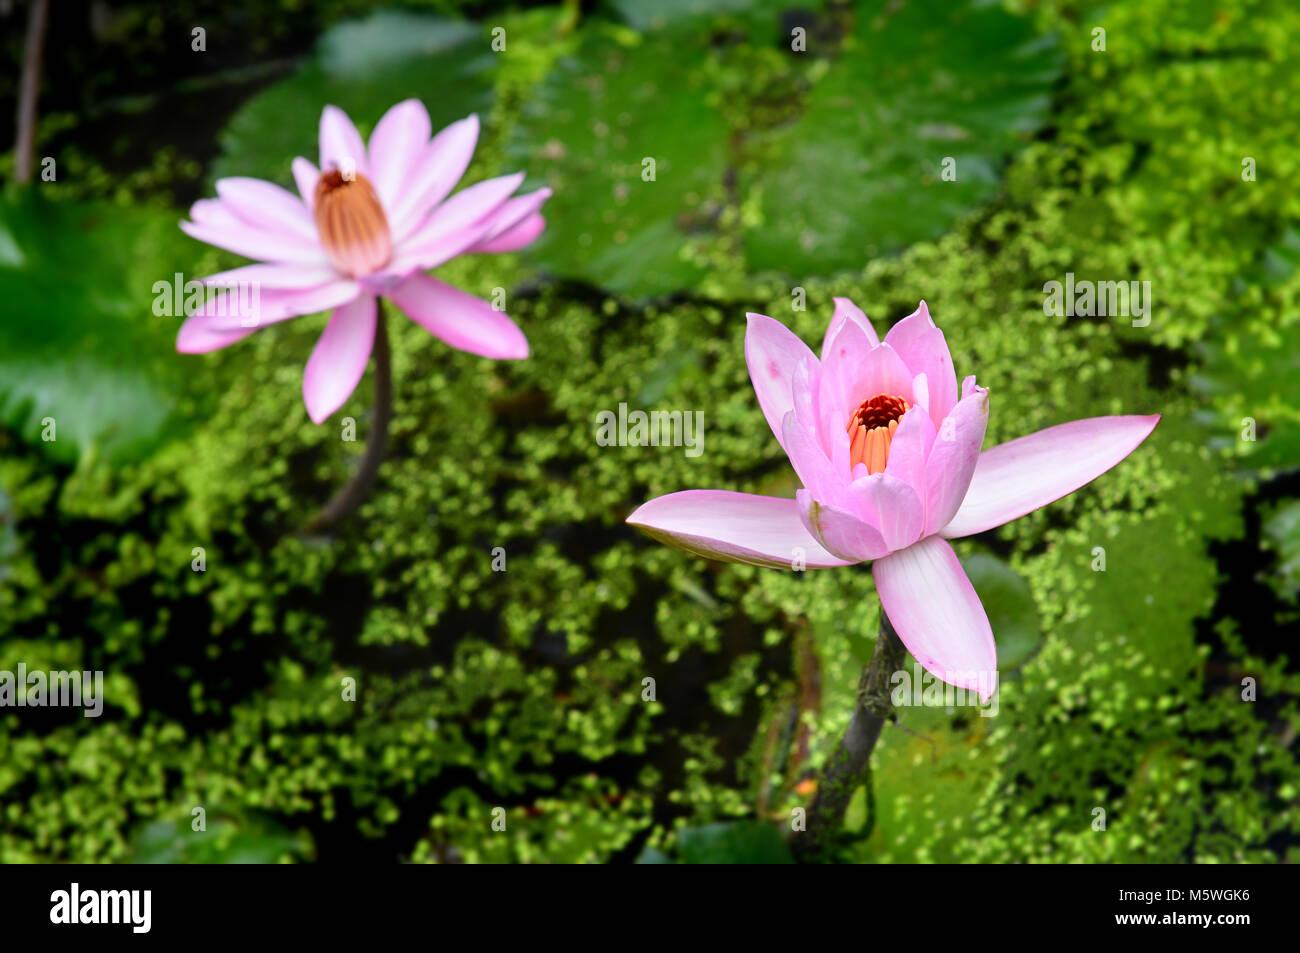 thailand tropical lutus in callage lake stock photo 175738842 alamy